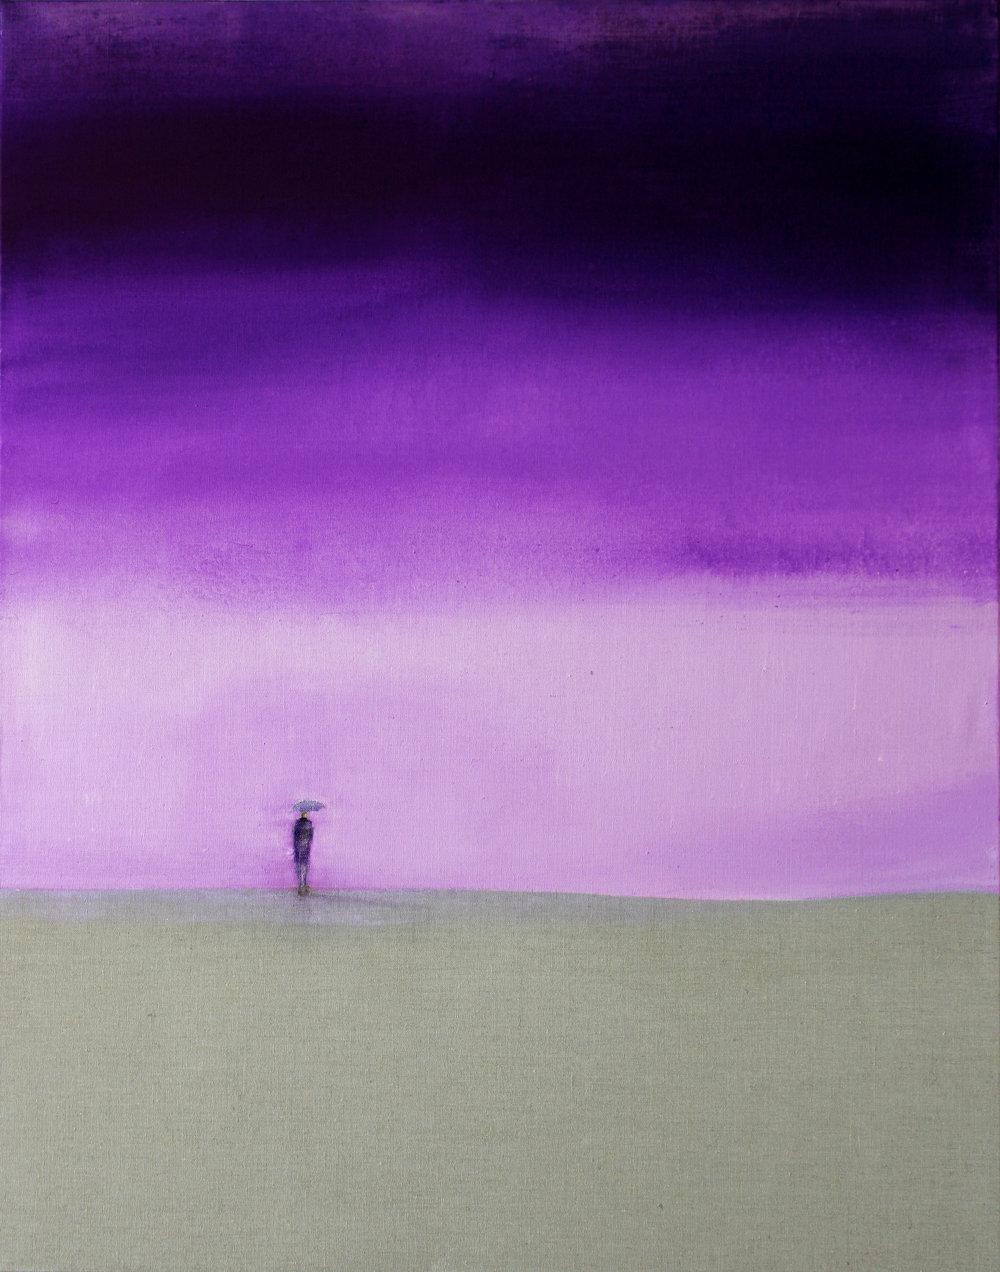 12_O.T.(Erik Van Den Storm), 2017, Acryl Öl auf Leinwand, 140x110cm.jpg